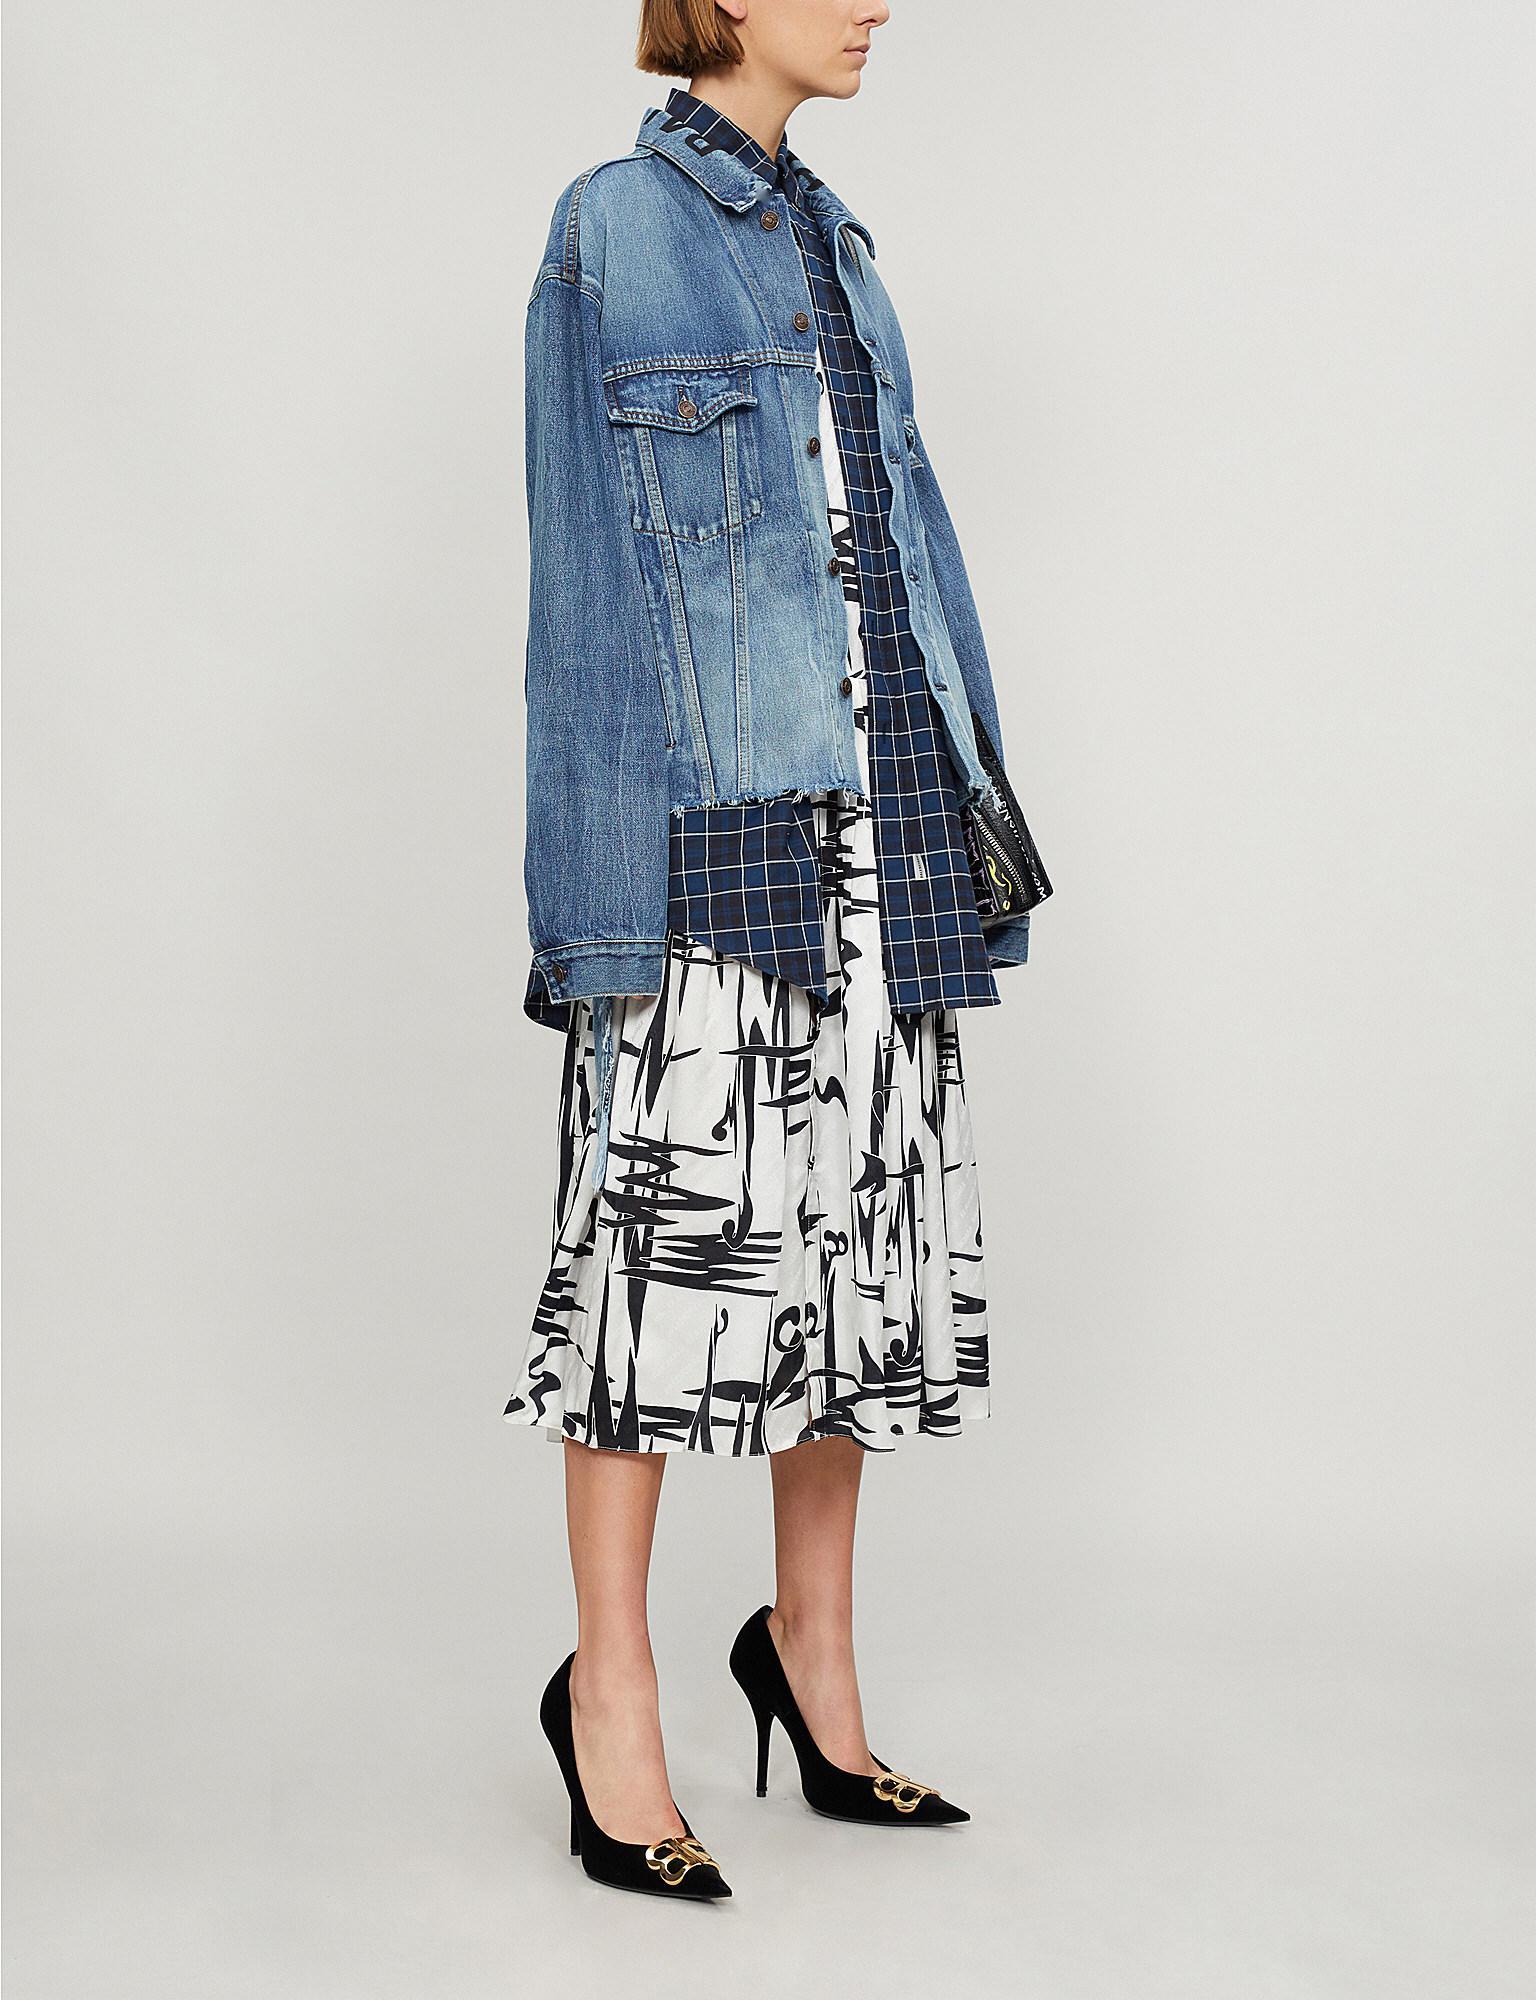 4984ec230350c4 Balenciaga Distressed Oversized Denim Jacket in Blue - Lyst